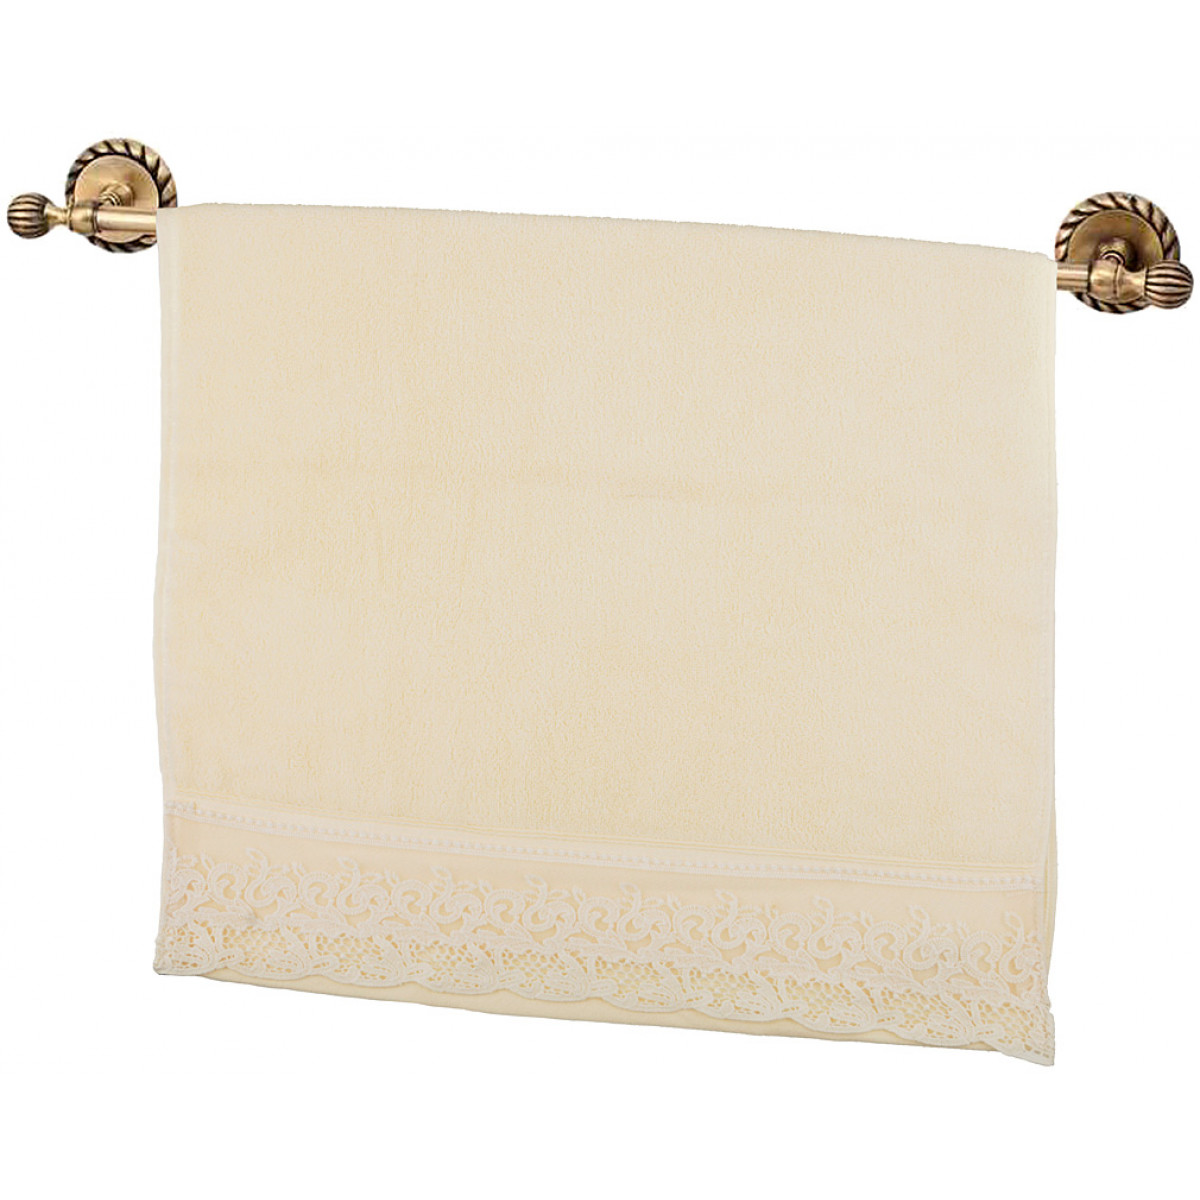 Полотенца Santalino Полотенце Heleen  (50х90 см) полотенце денастия полотенце денастия 50х90 см хлопок